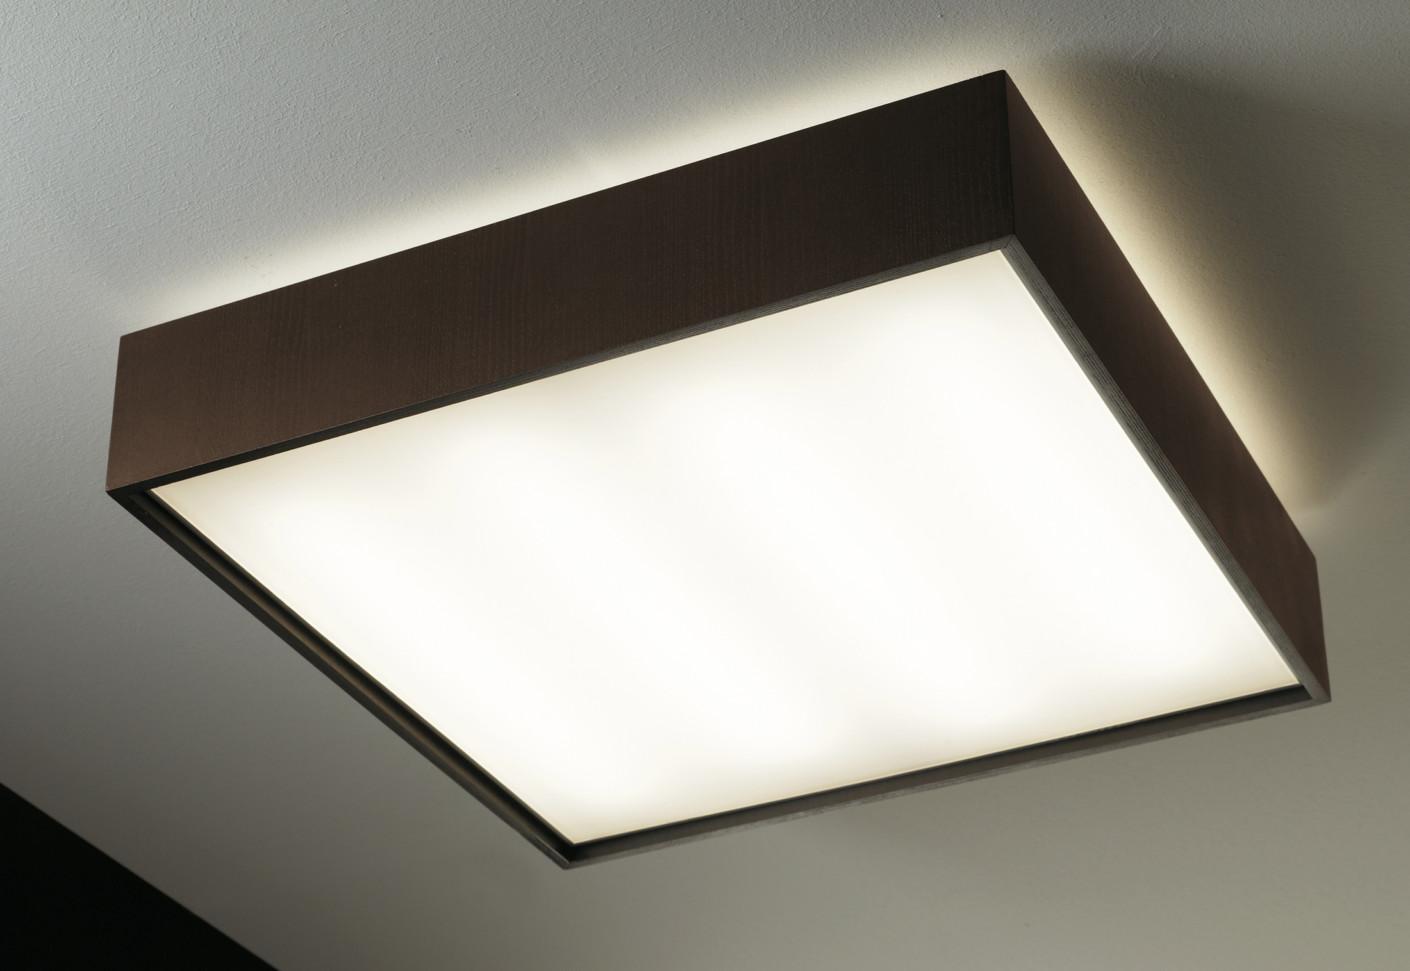 Quadrat C120x120 Plafón LED 6x24,8W - Madera roble